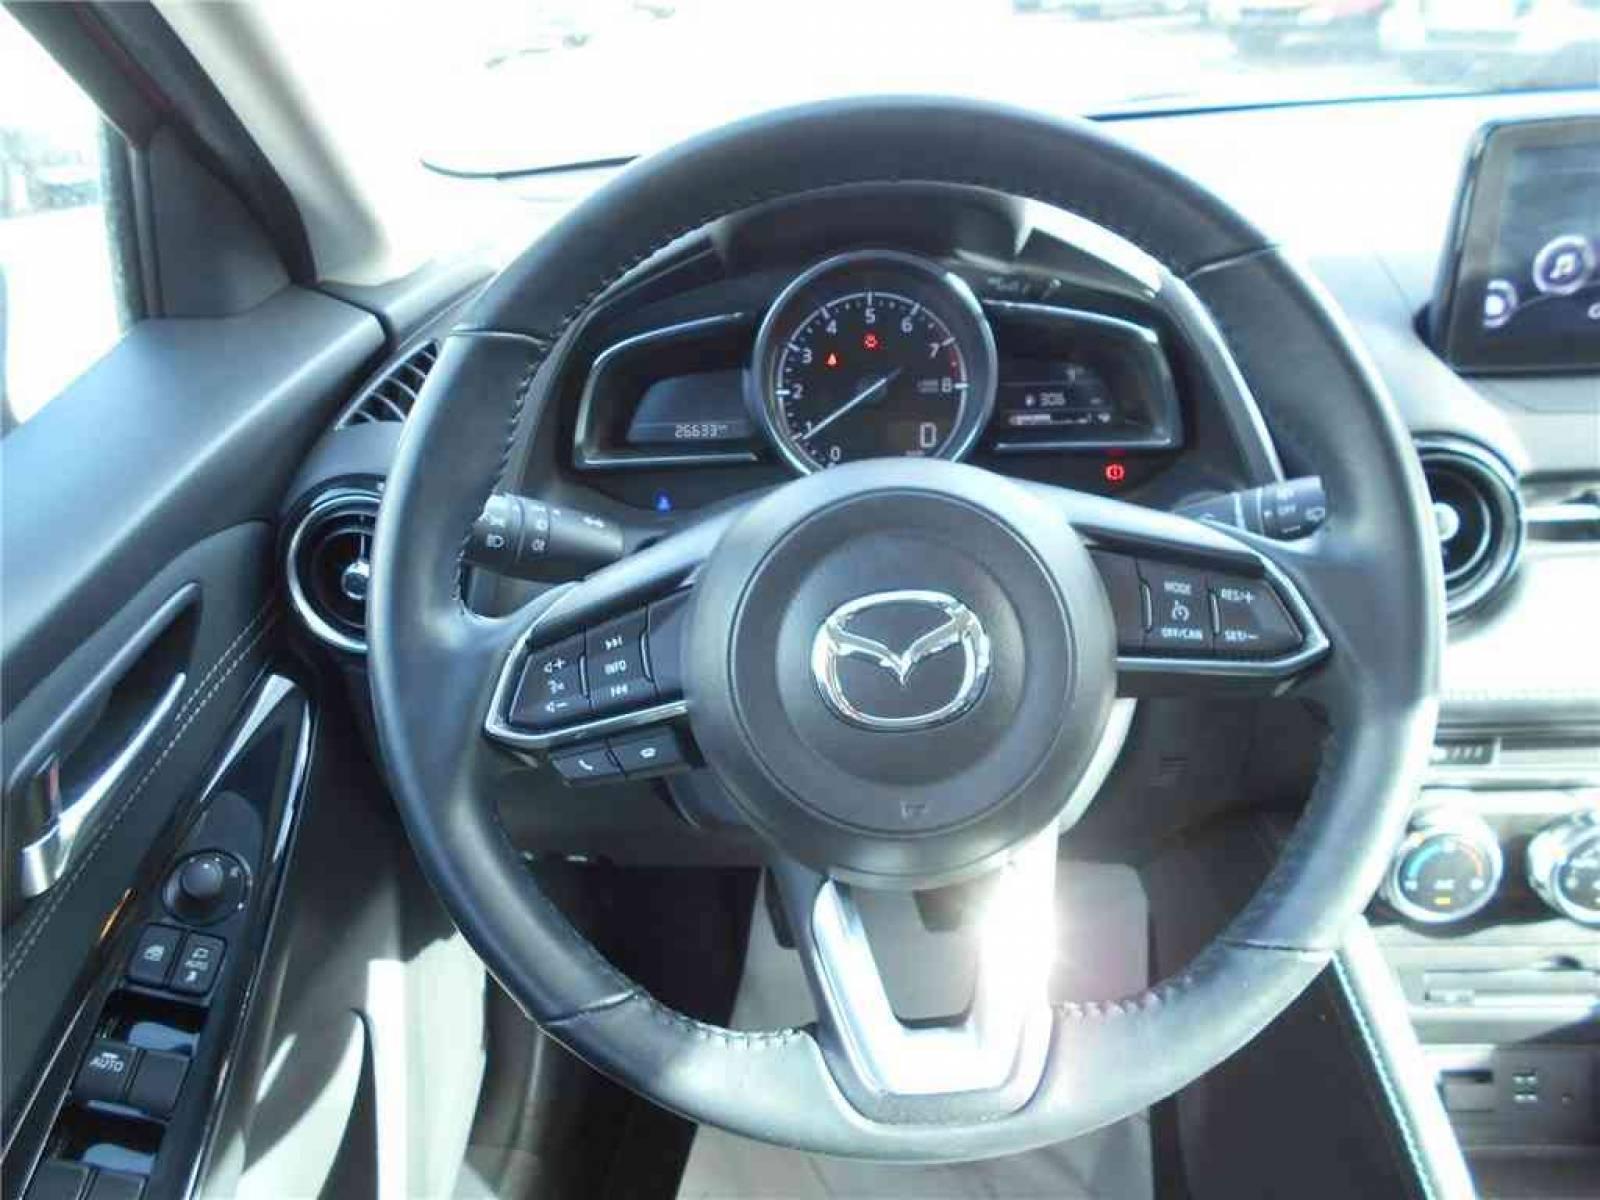 MAZDA Mazda2 1.5L SKYACTIV-G 115ch - véhicule d'occasion - Groupe Guillet - Chalon Automobiles - 71100 - Chalon-sur-Saône - 18